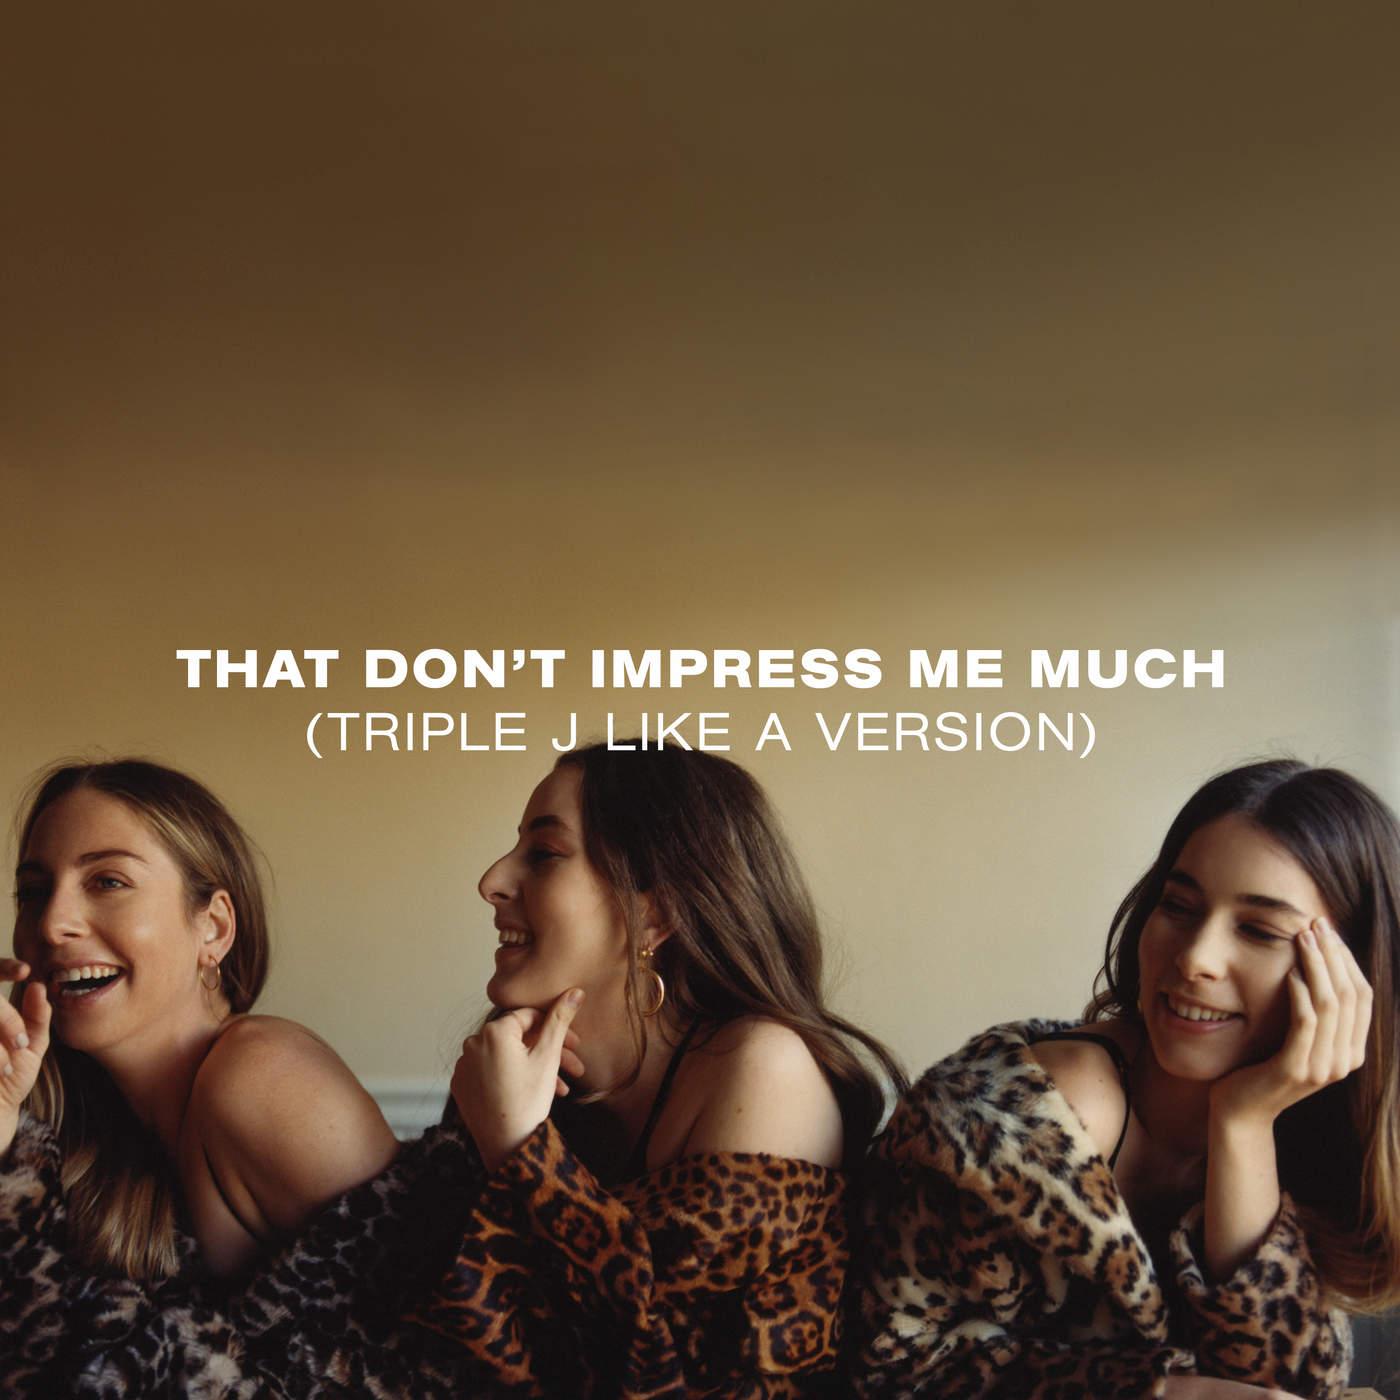 HAIM - That Don't Impress Me Much (triple j Like a Version) - Single